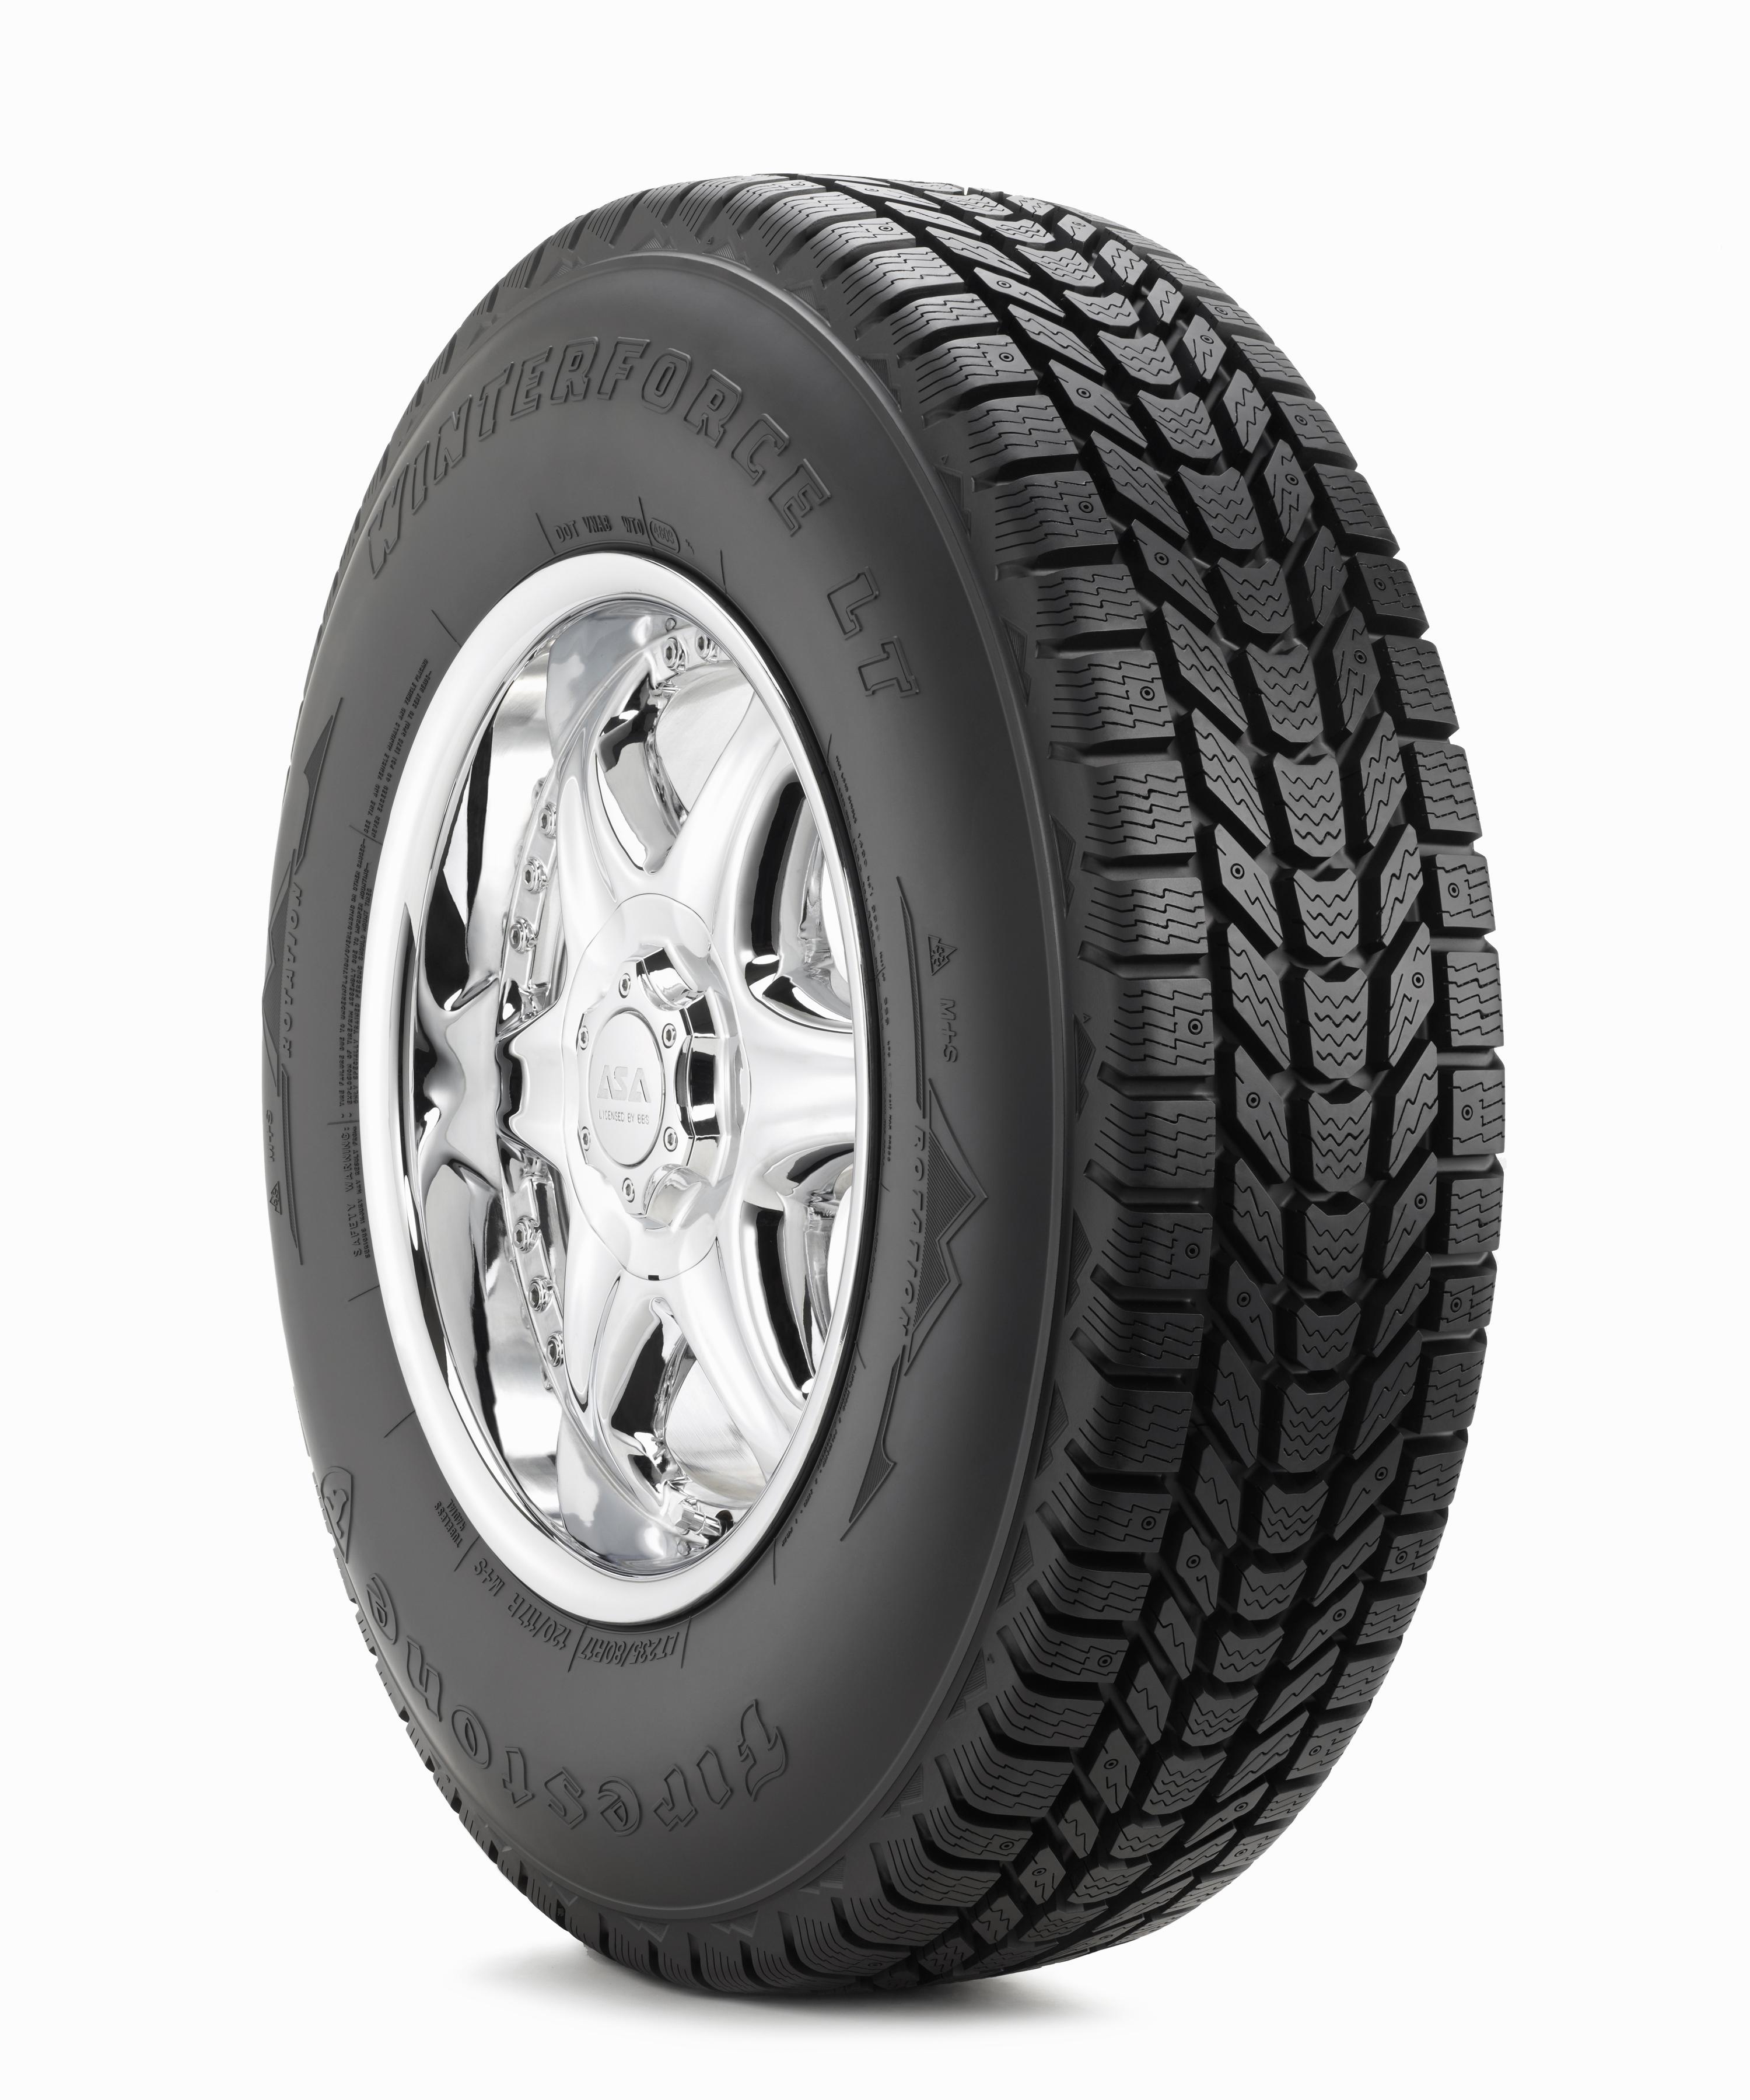 Firestone Winterforce Tires >> LT265/70R17 Firestone Winterforce LT Snow Tire (LRE)